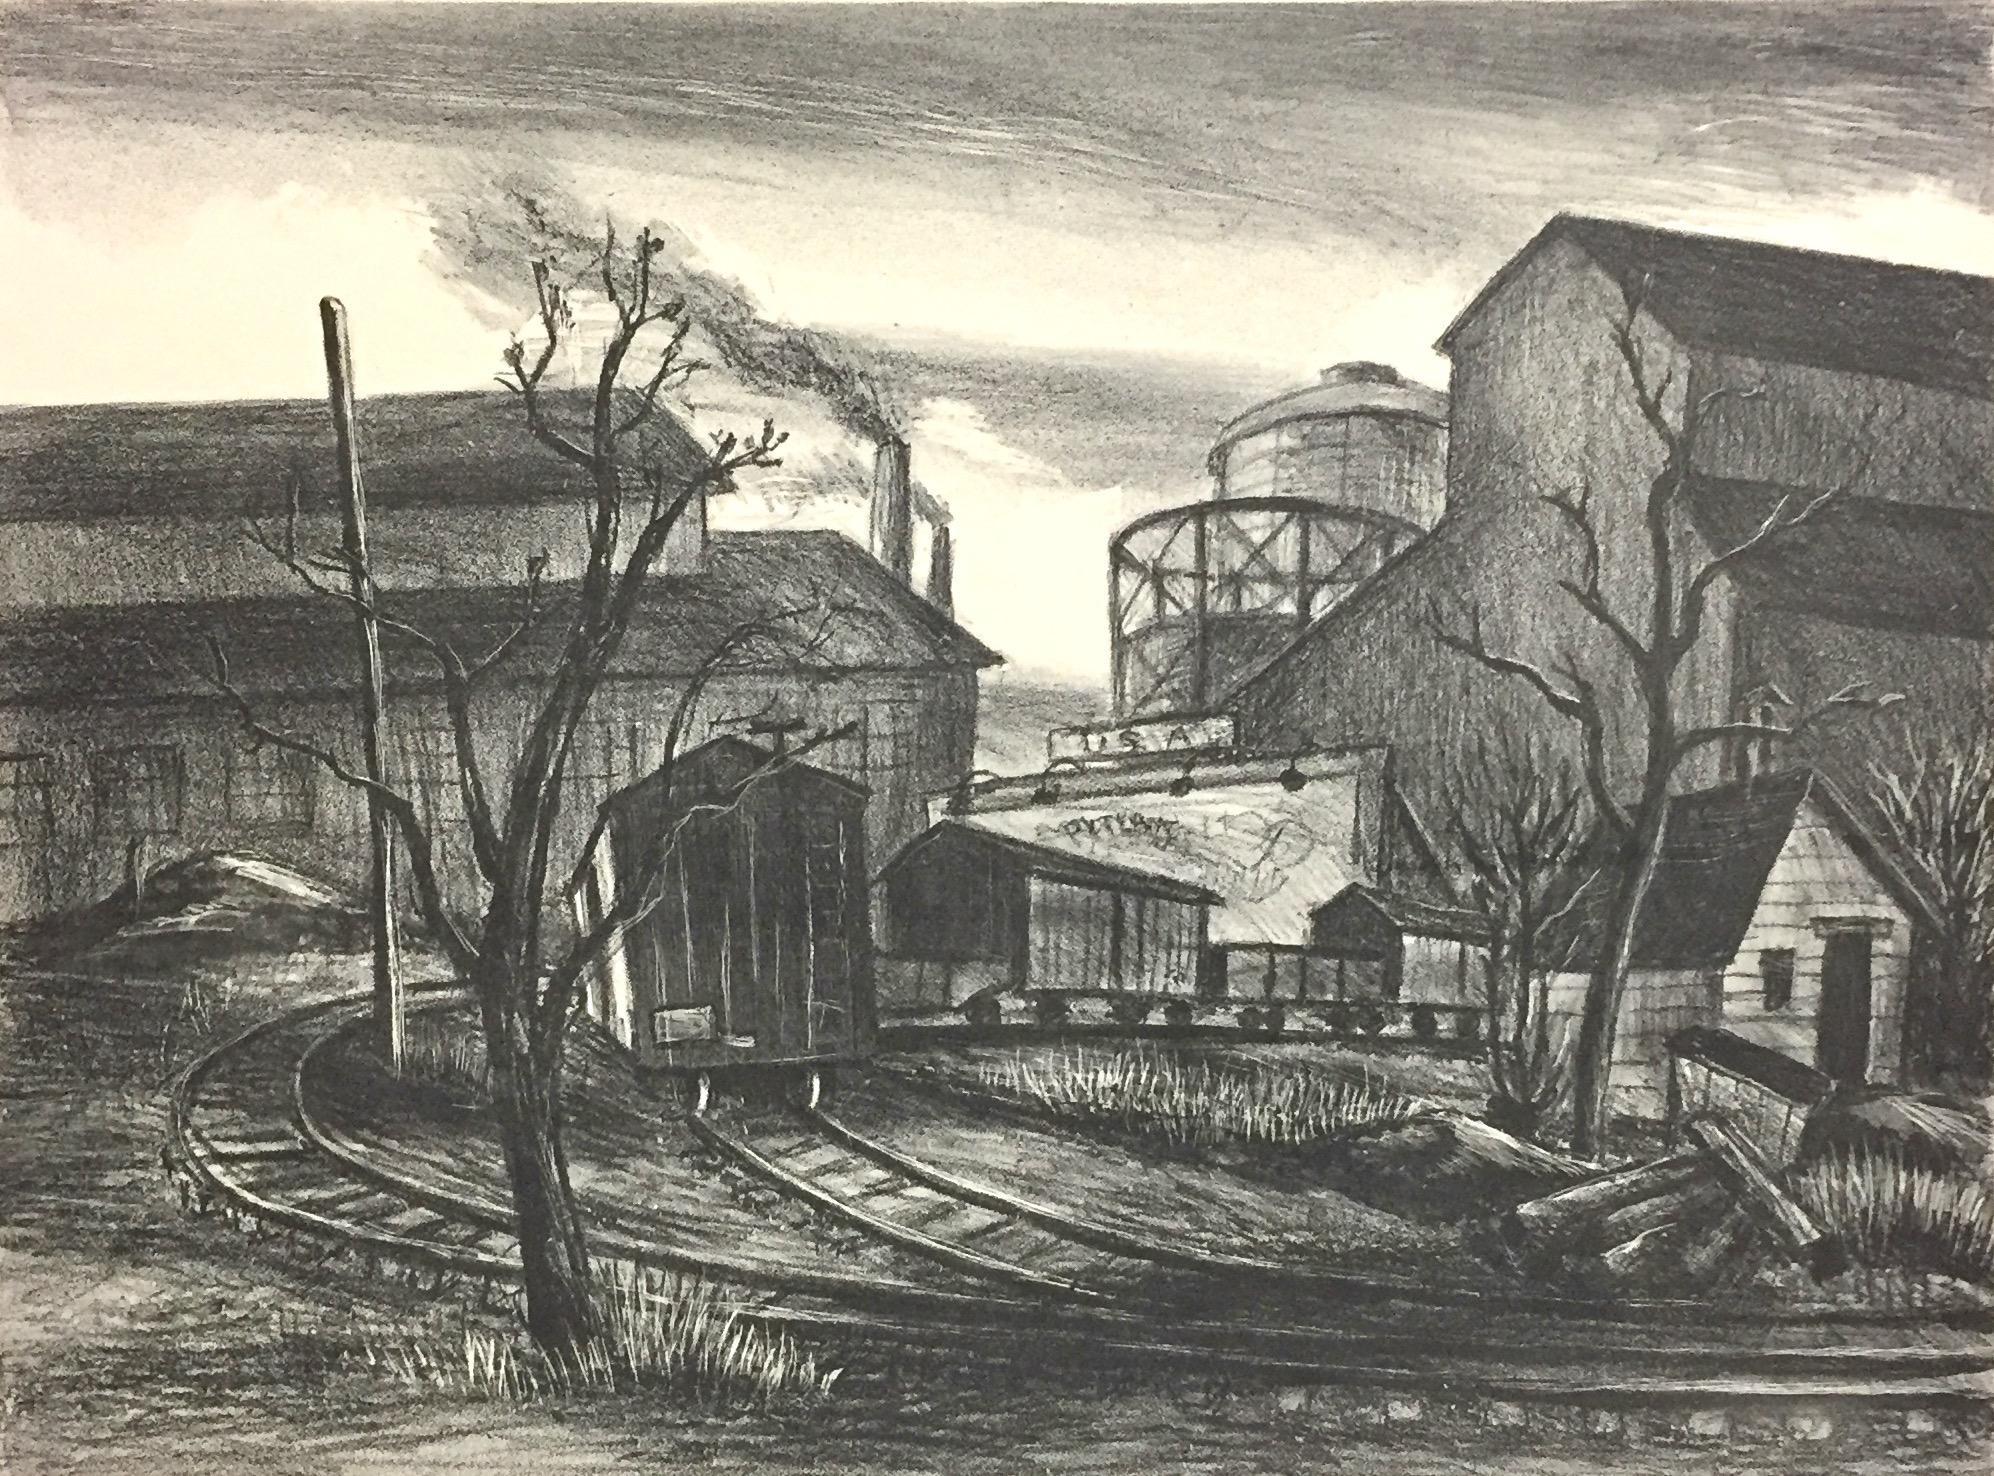 (Industrial Landscape, New York City)